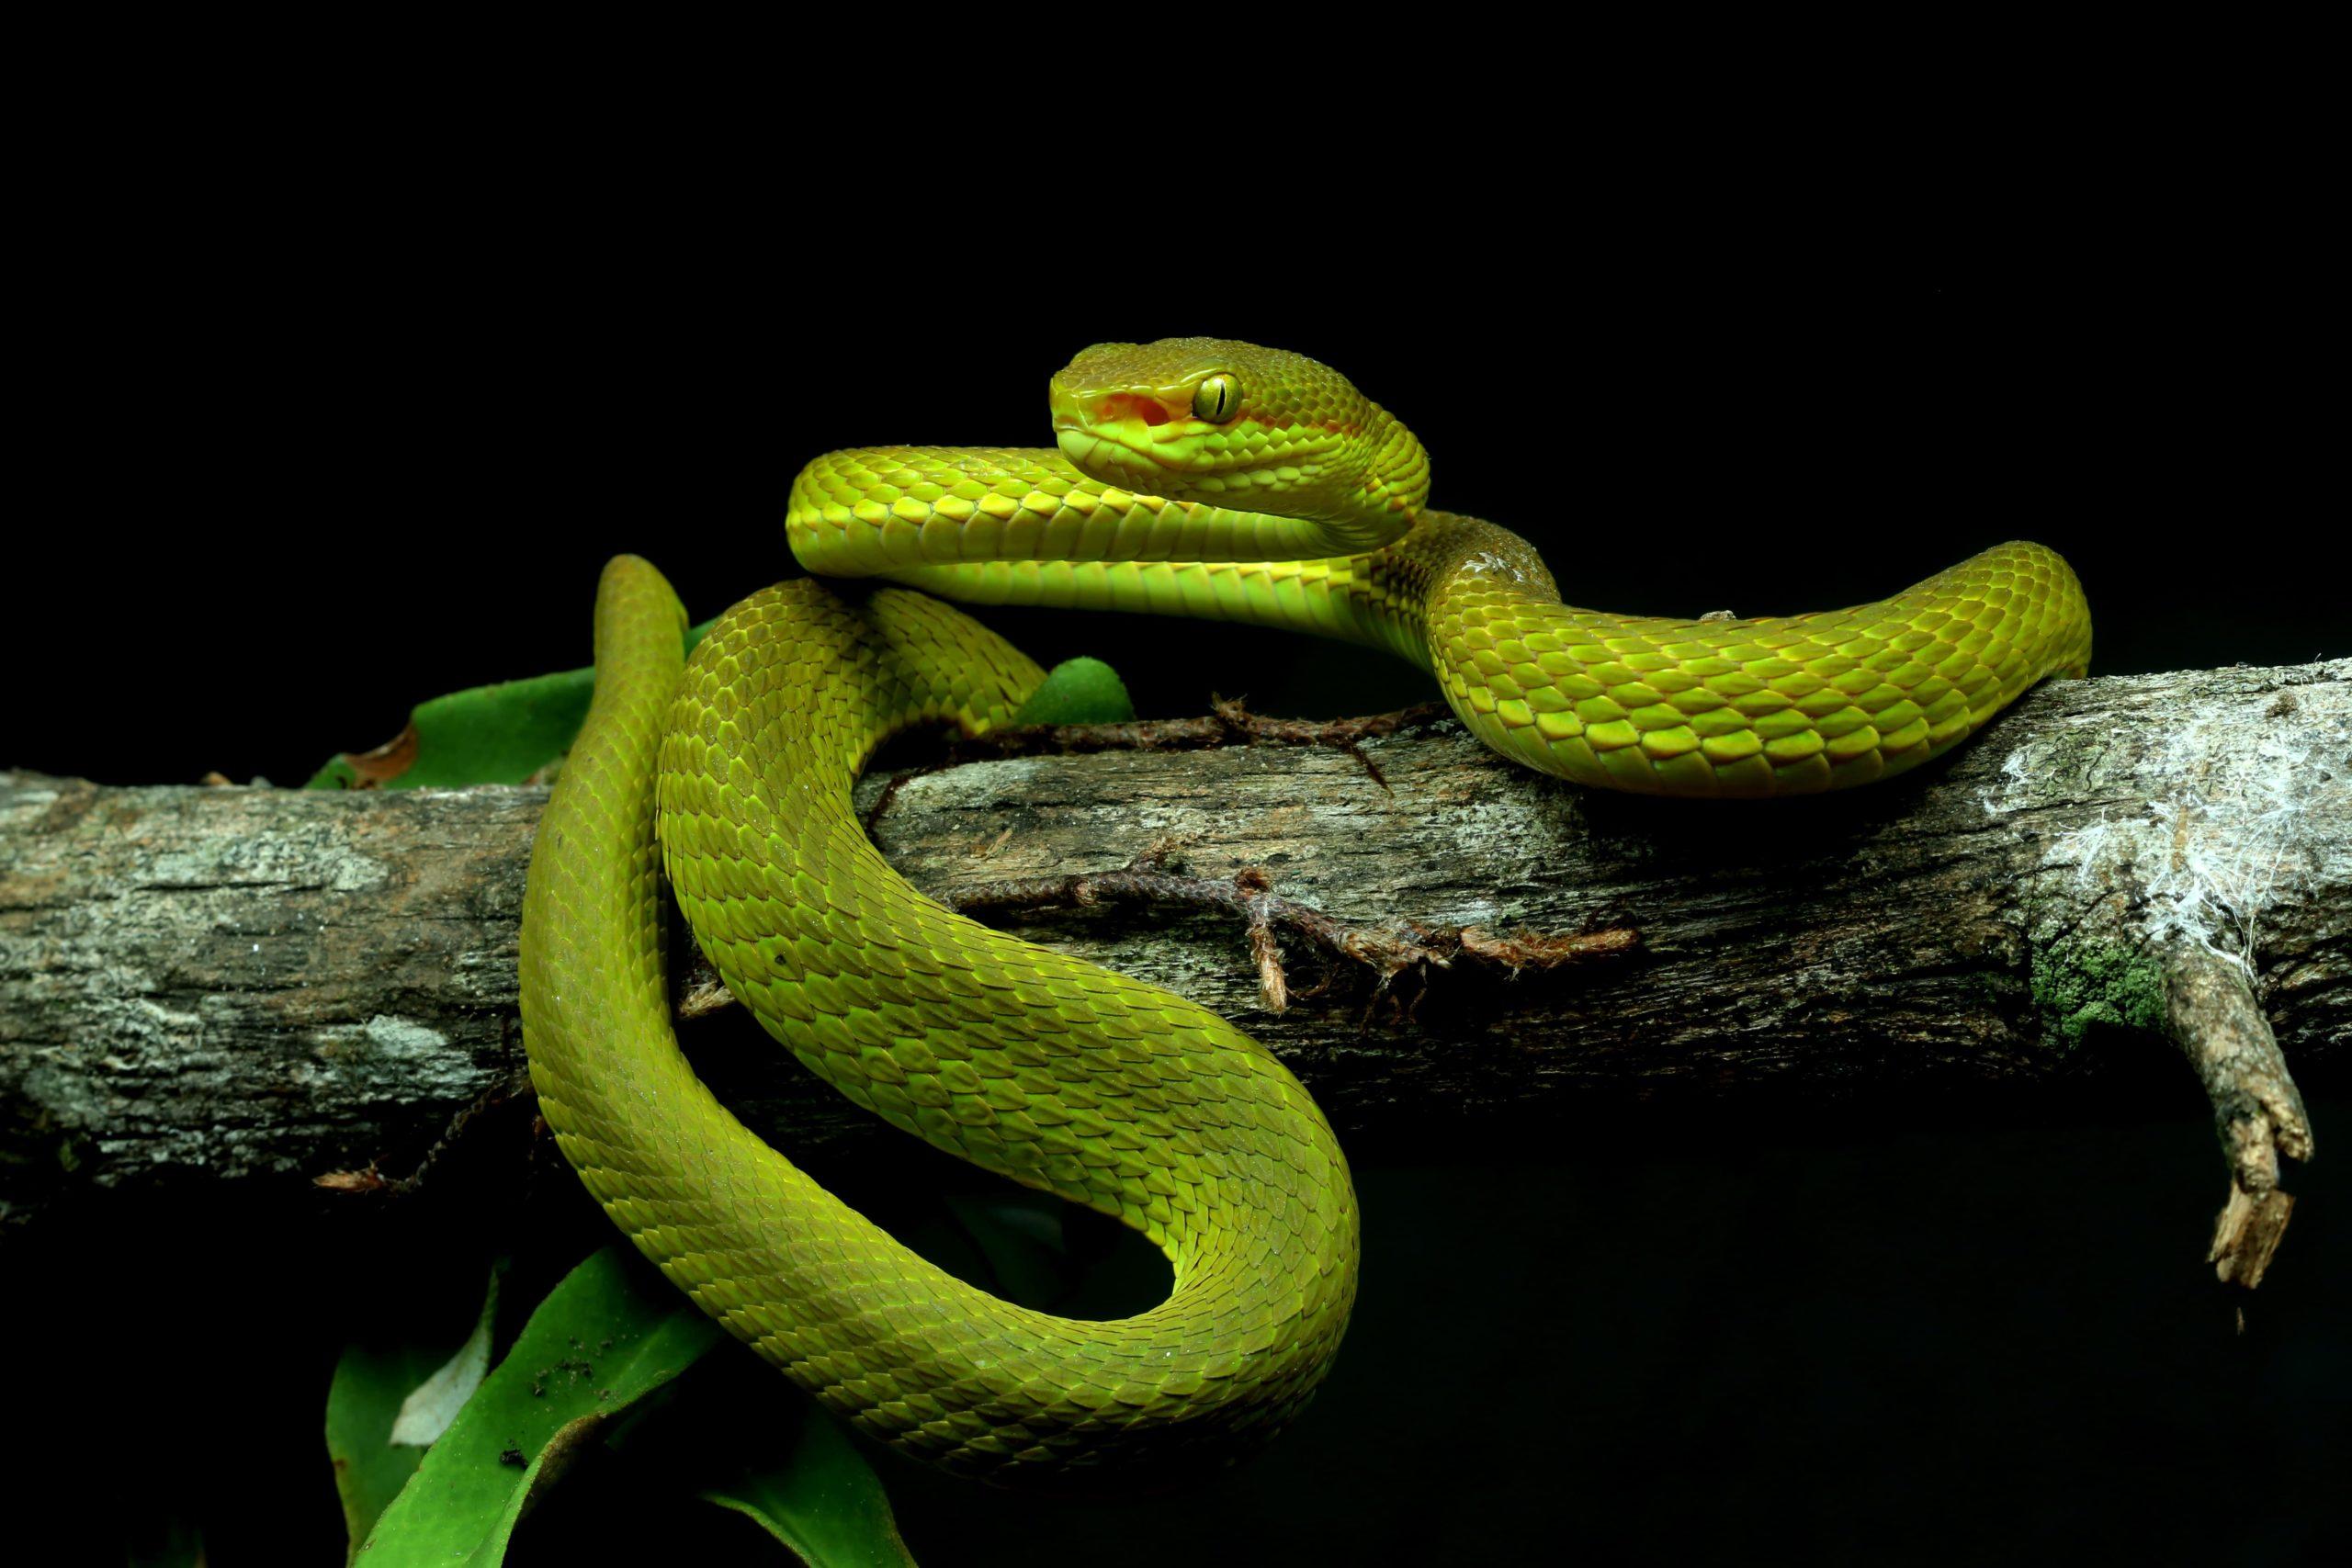 Salazar's pit viper (Trimeresurus salazar). Photo courtesy of Zeeshan A. Mirza